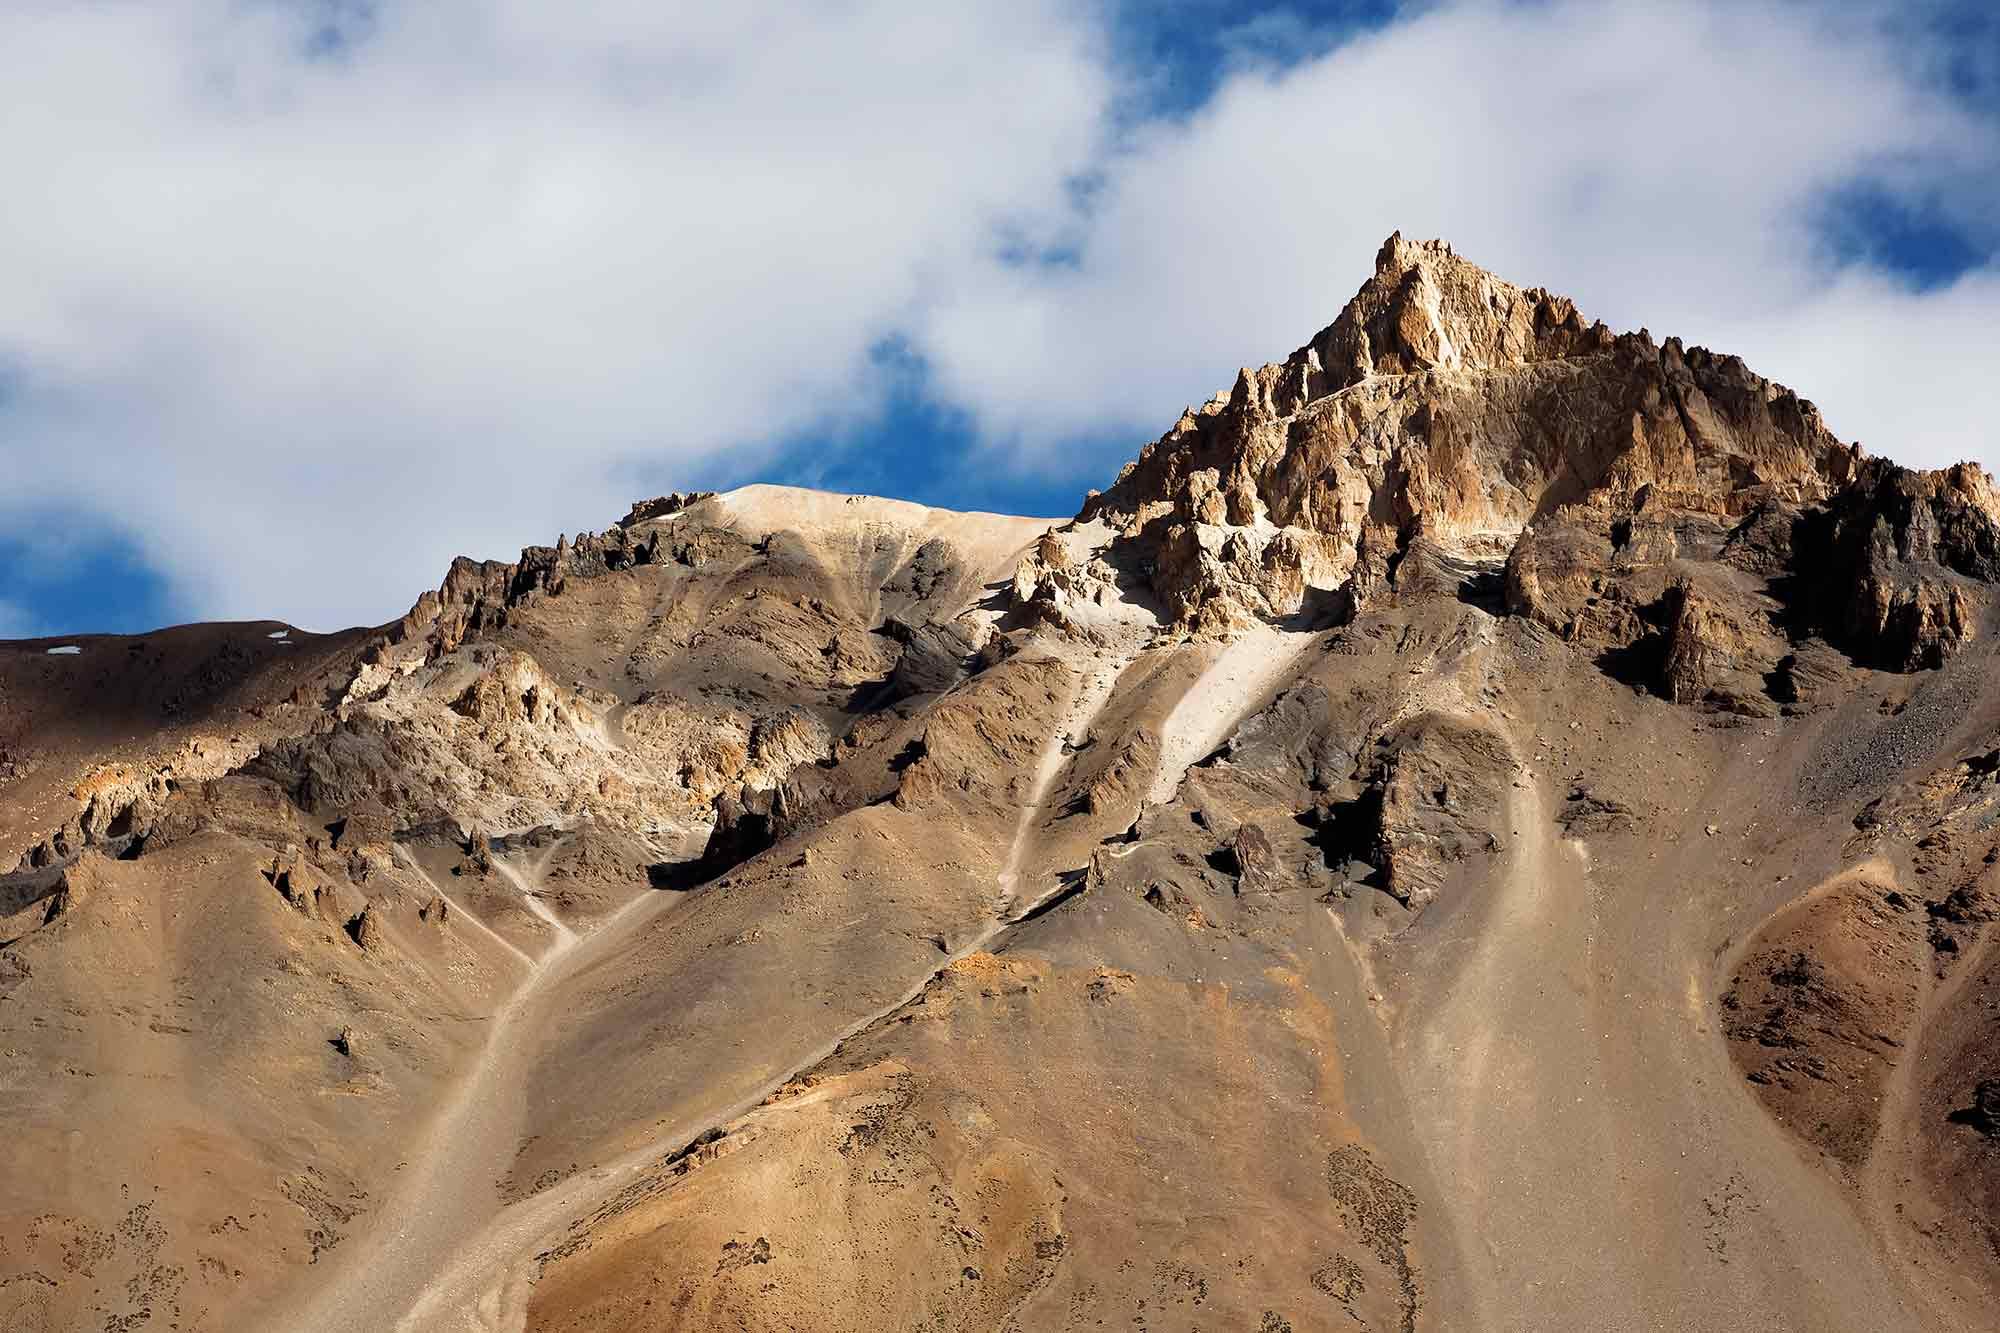 Sarchu-leh-manali-highway-kashmir-ladakh-india